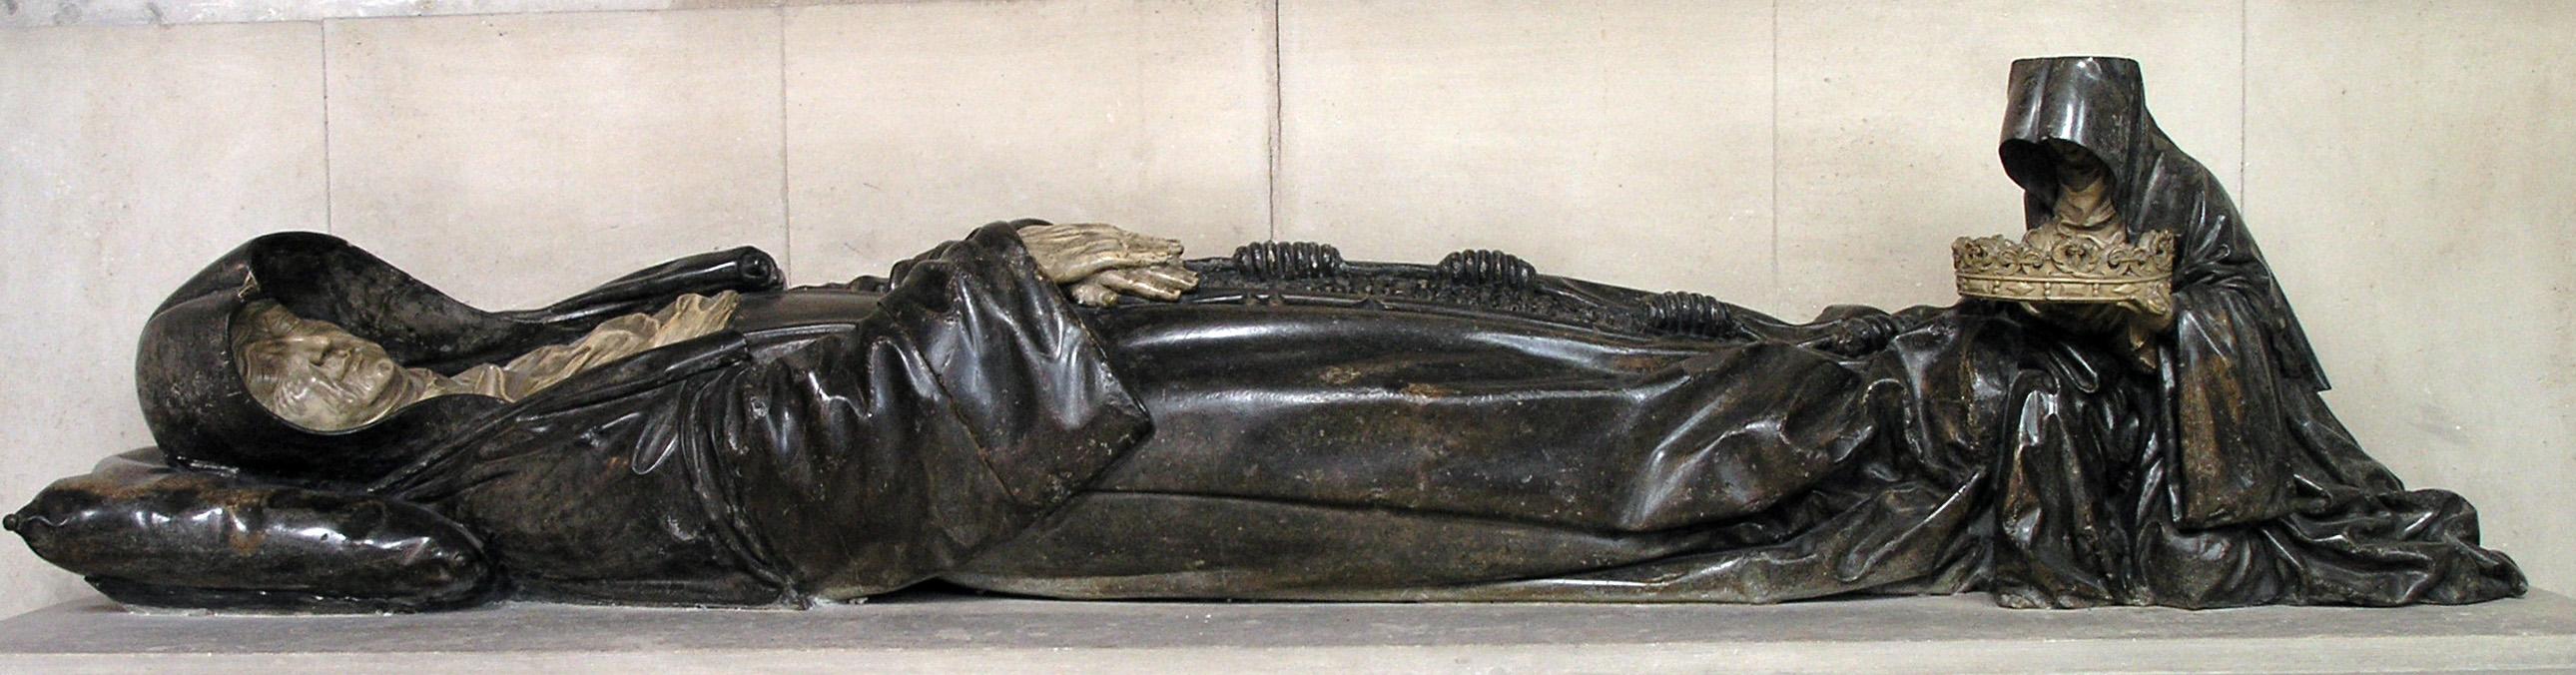 Philippa of Guelders